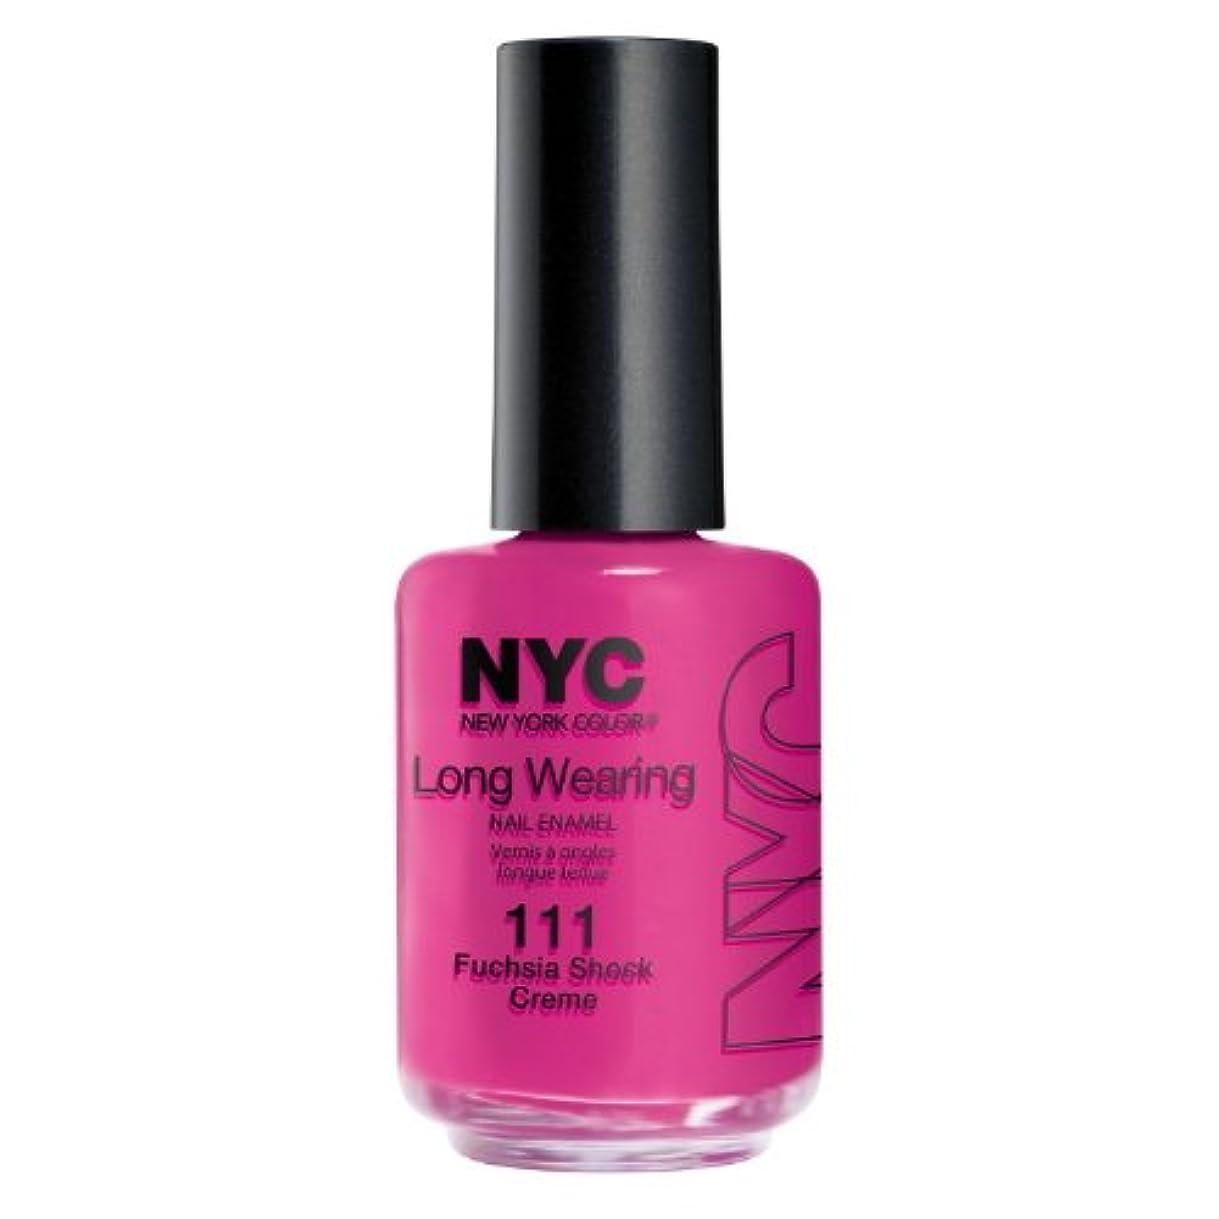 (3 Pack) NYC Long Wearing Nail Enamel - Fuchisia Shock Creme (並行輸入品)